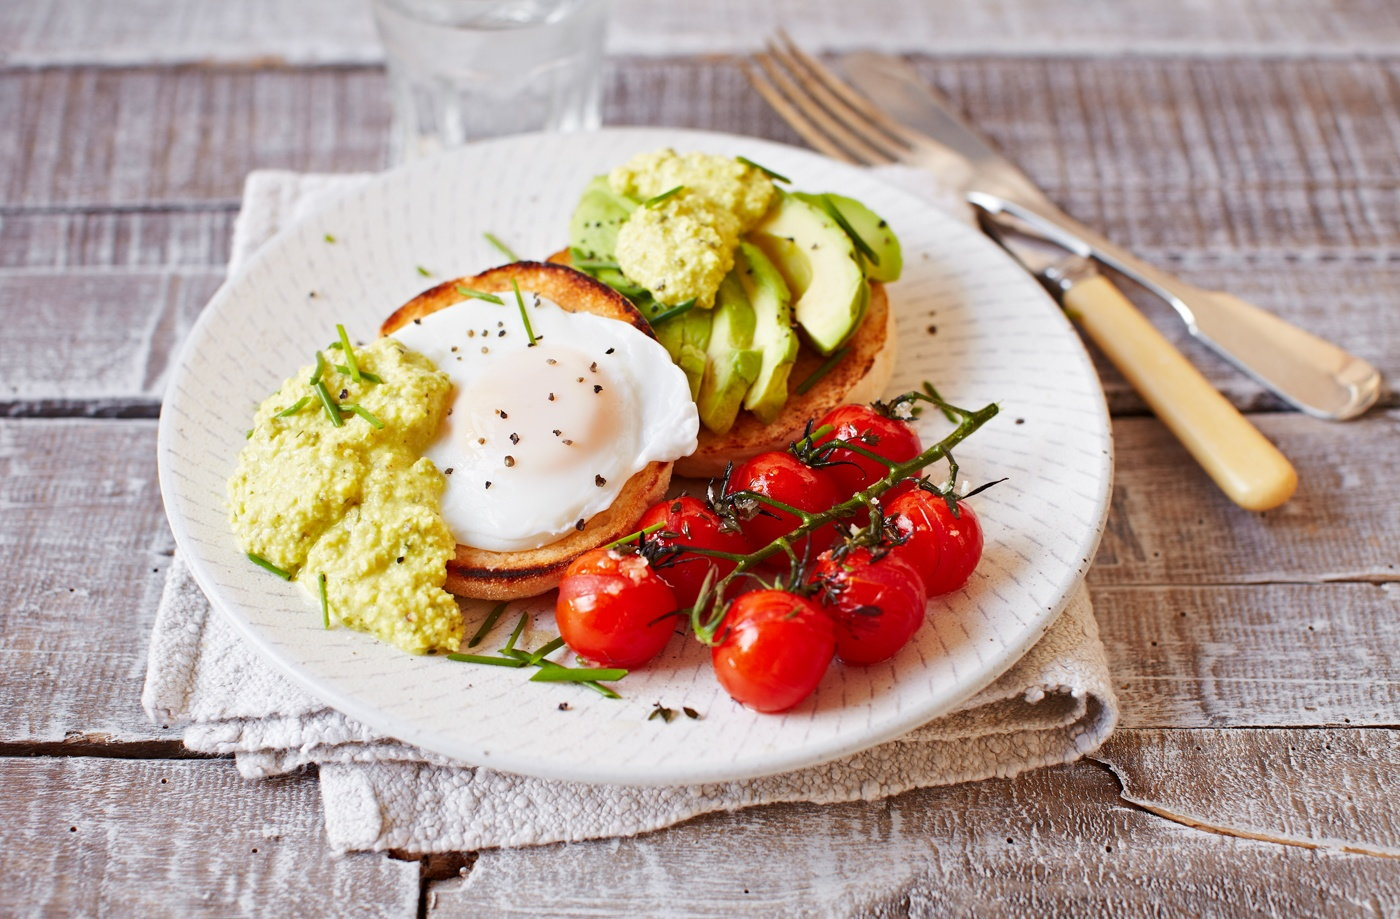 ... eggs benedict vegetable eggs benedict recipe on food52 vegetarian eggs